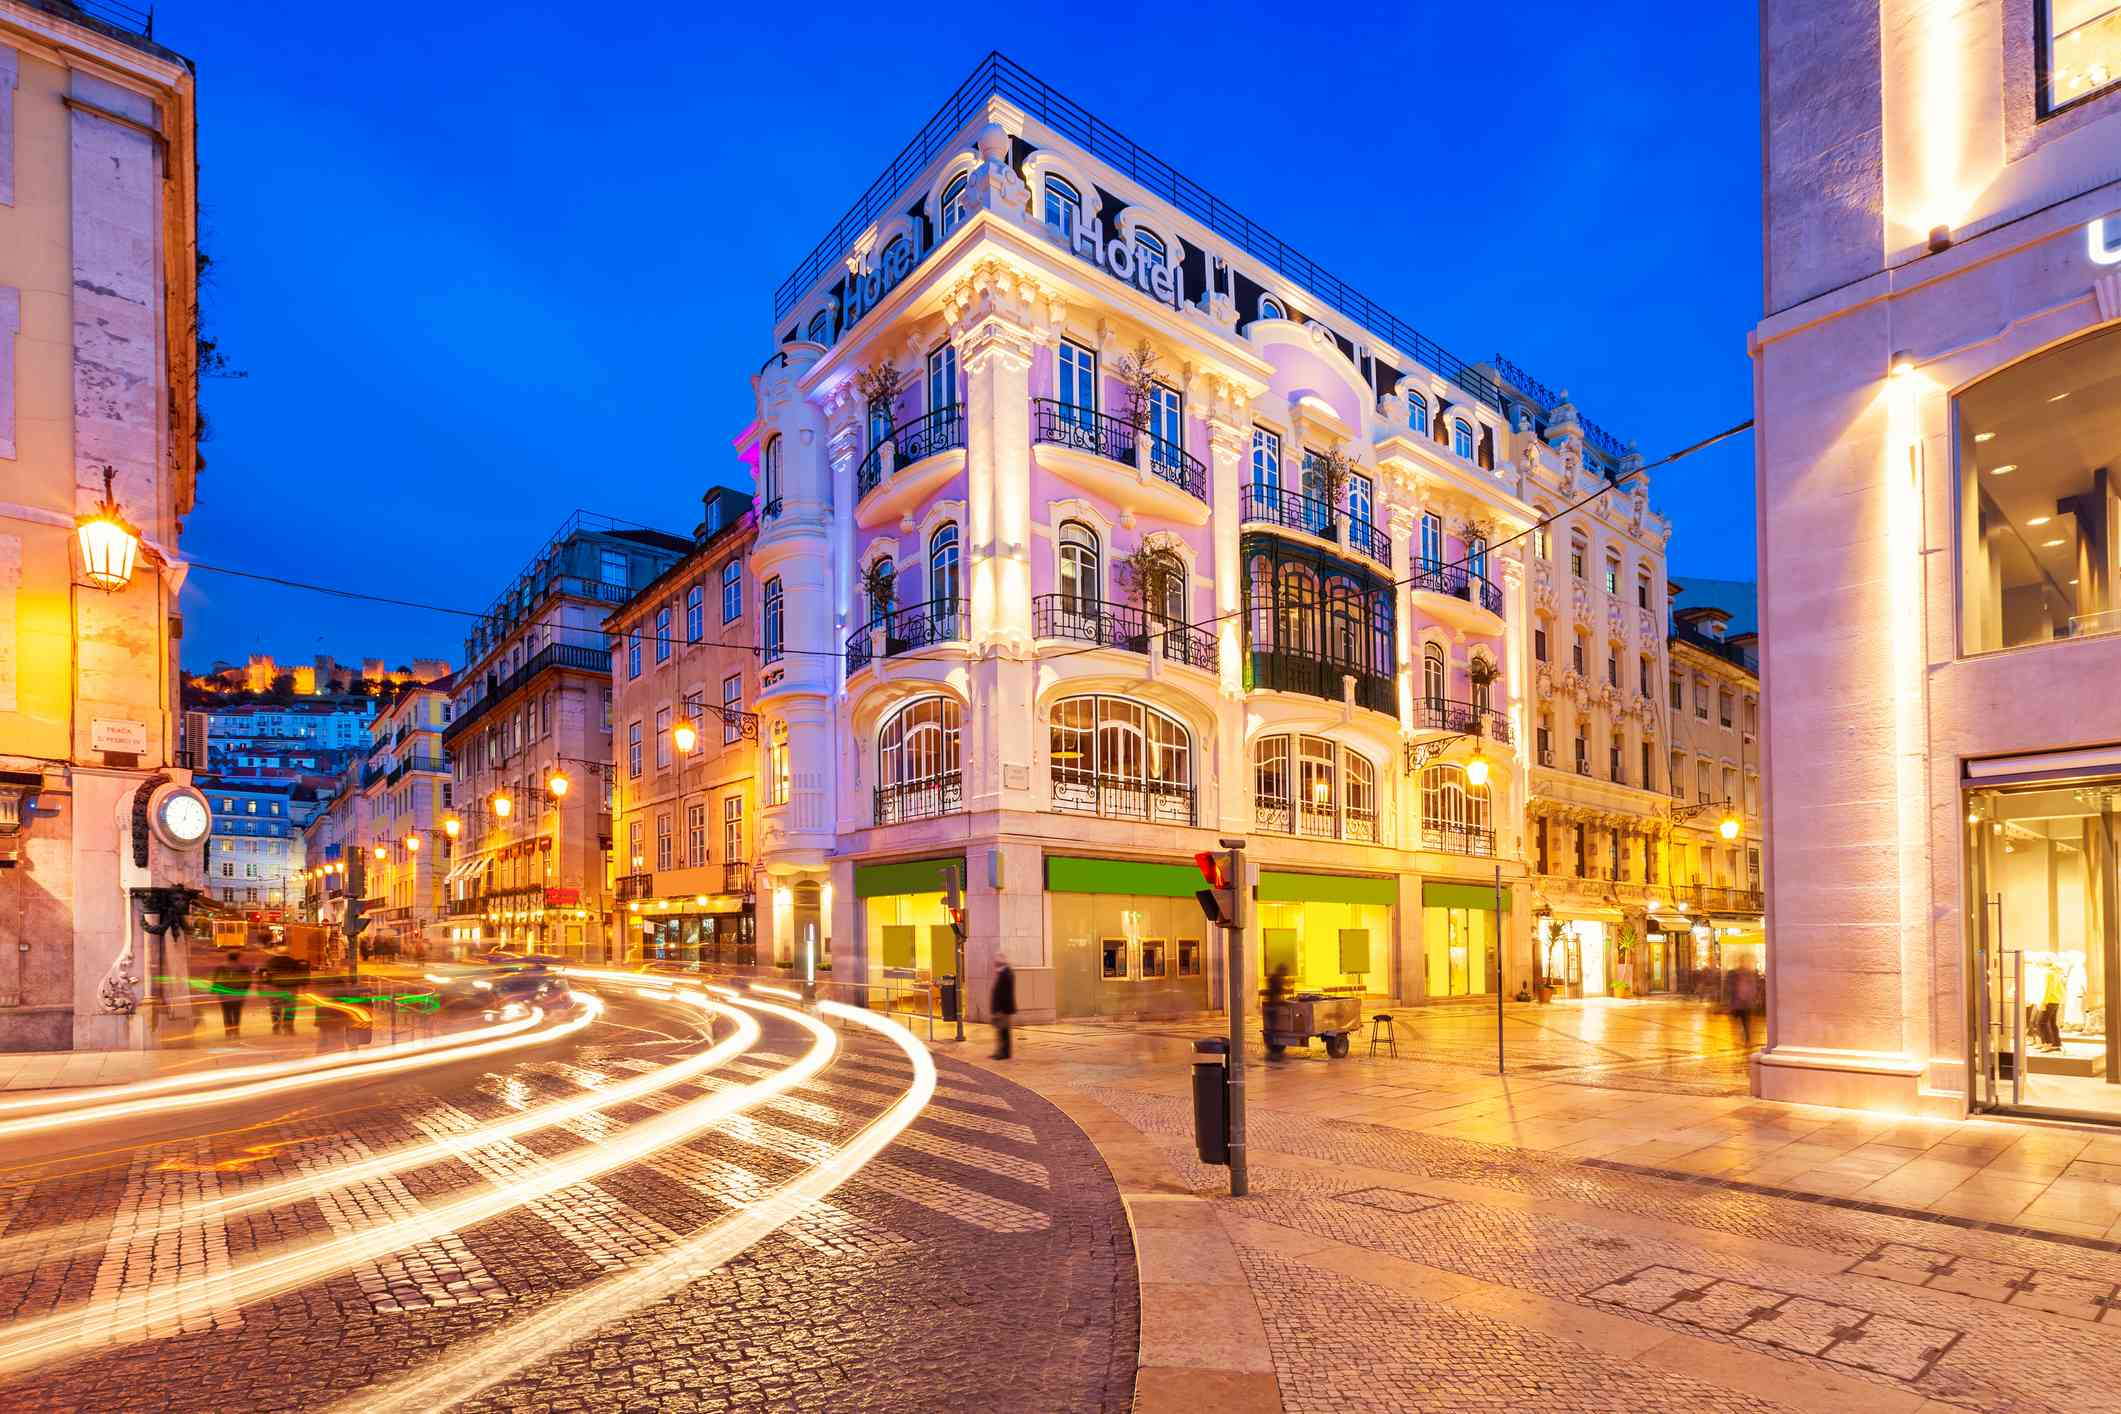 Rossio Square in downtown Lisbon Portugal